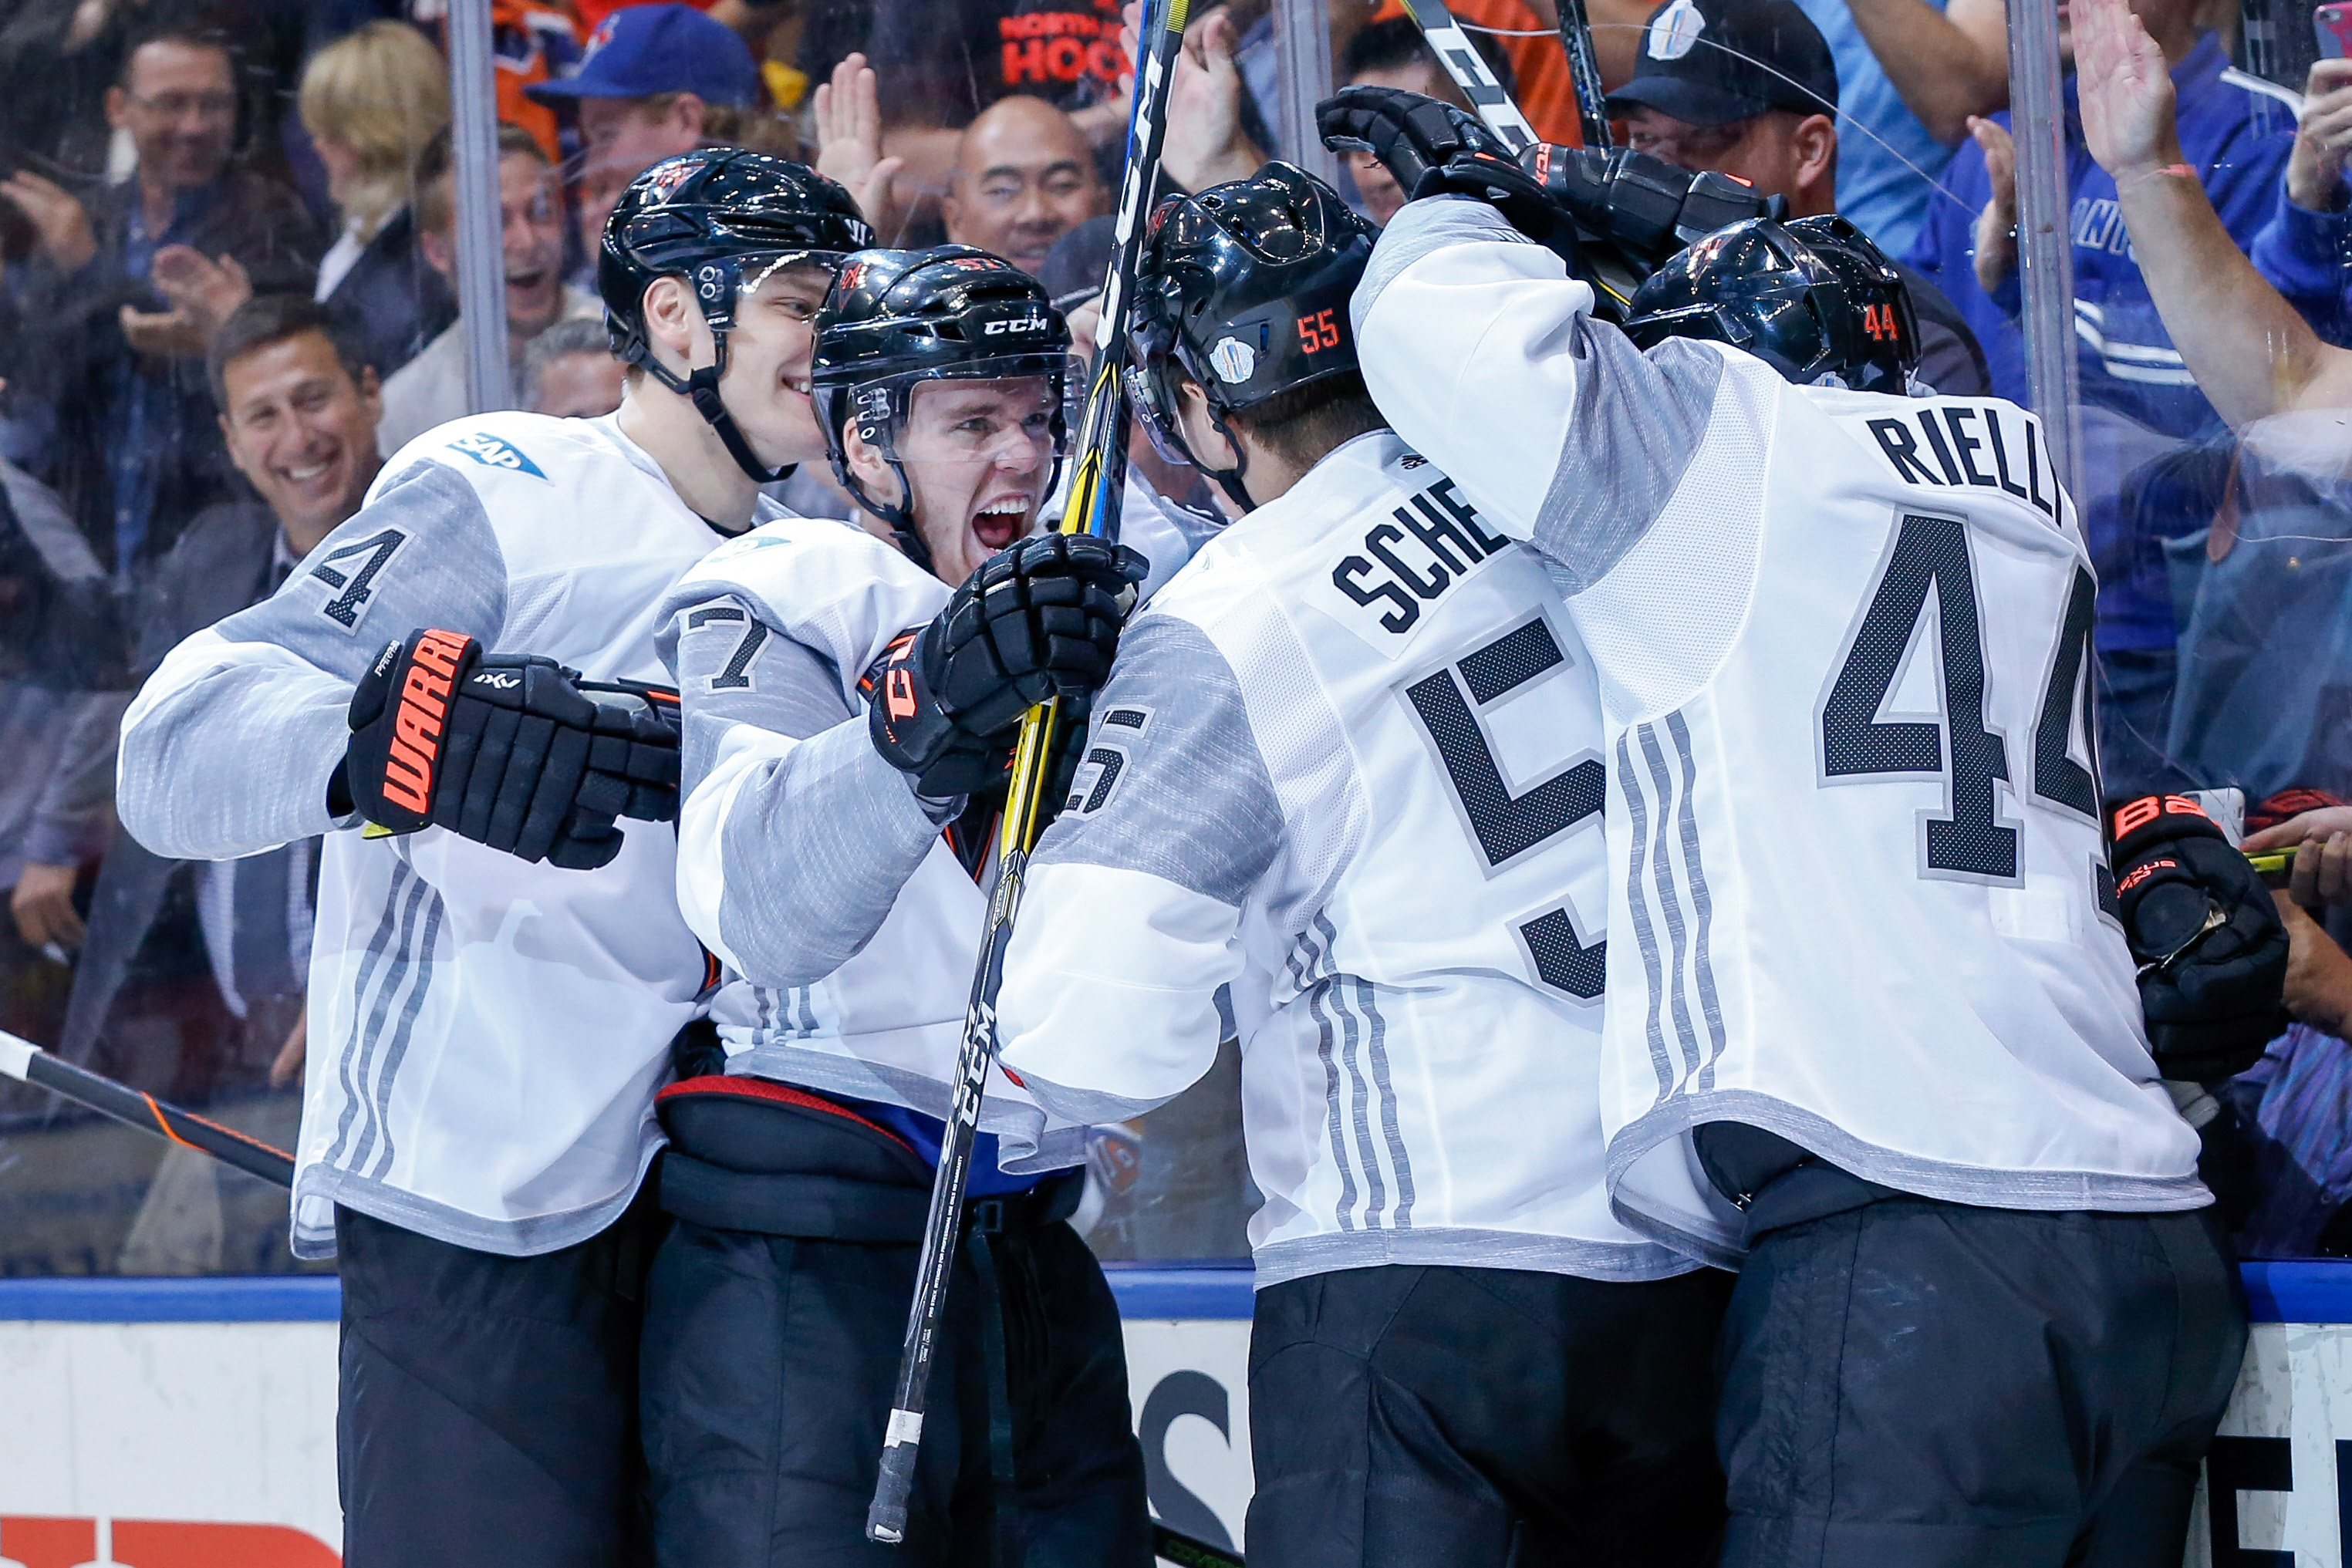 Hockey: World Cup of Hockey-Team North America vs Team Sweden